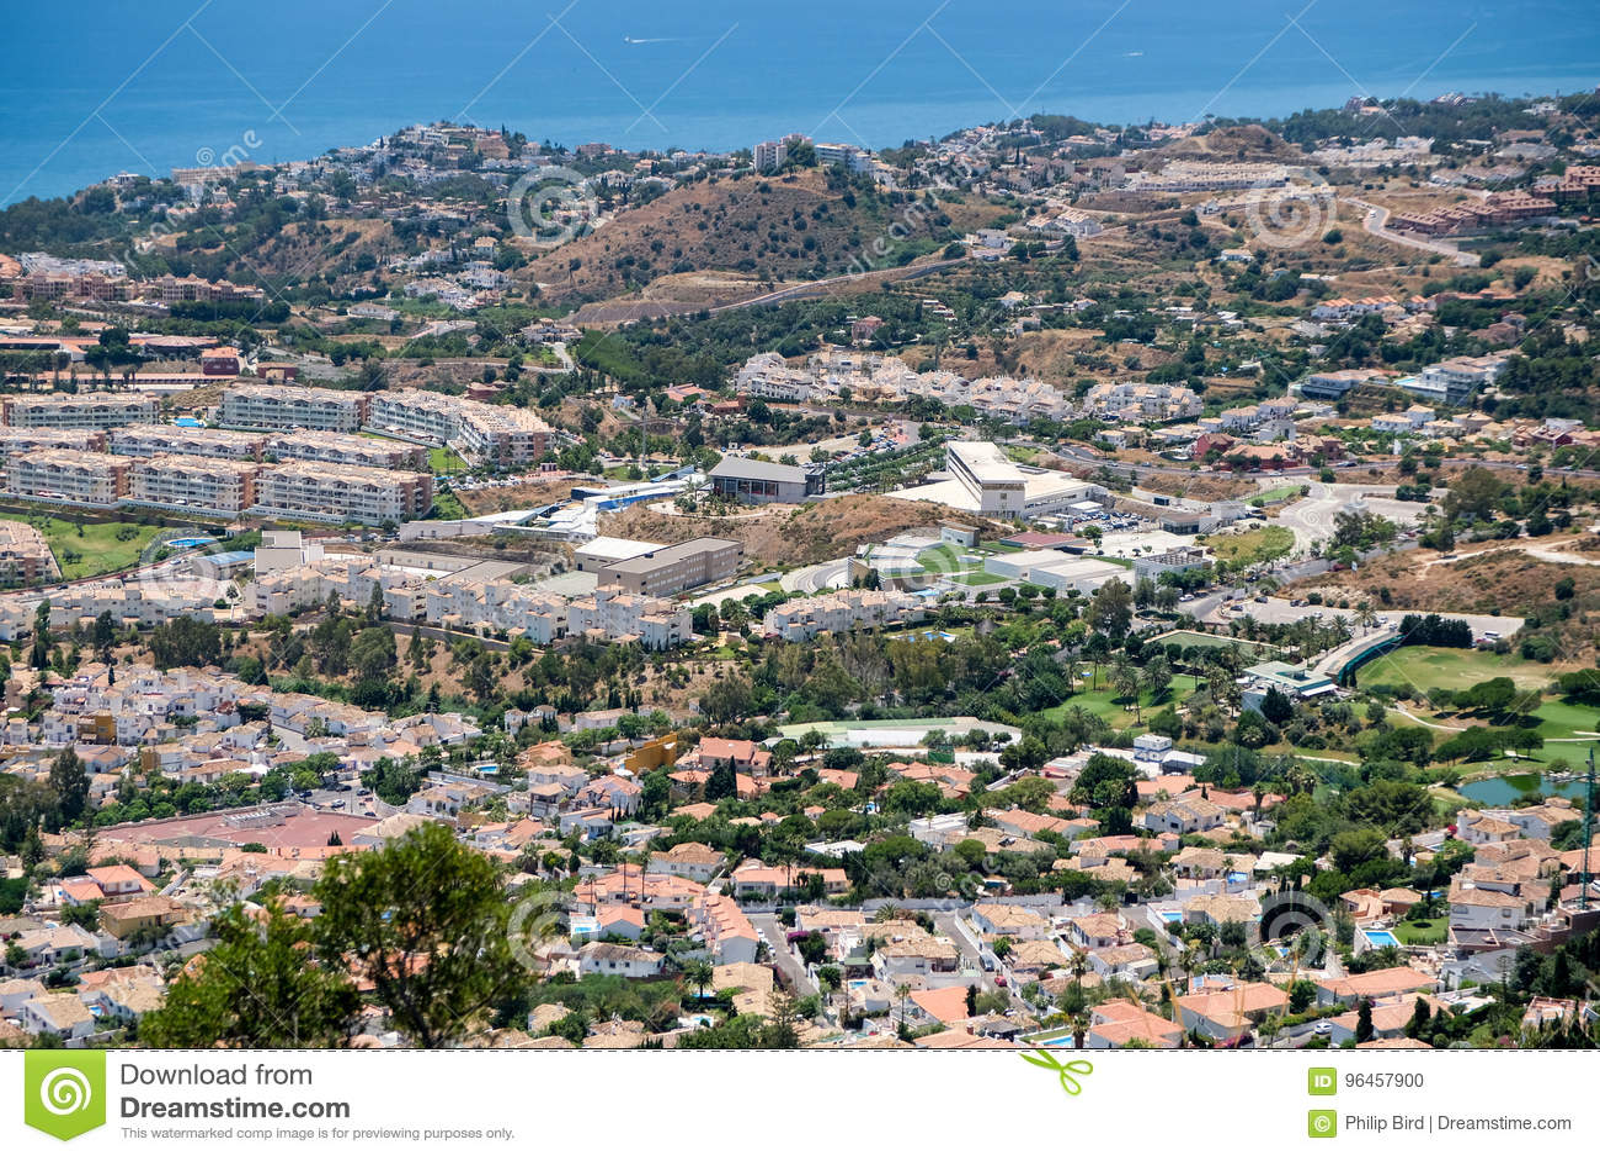 BENALMADENA, ANDALUCIA/SPAIN - 7. JULI: Ansicht vom Berg Calamorr